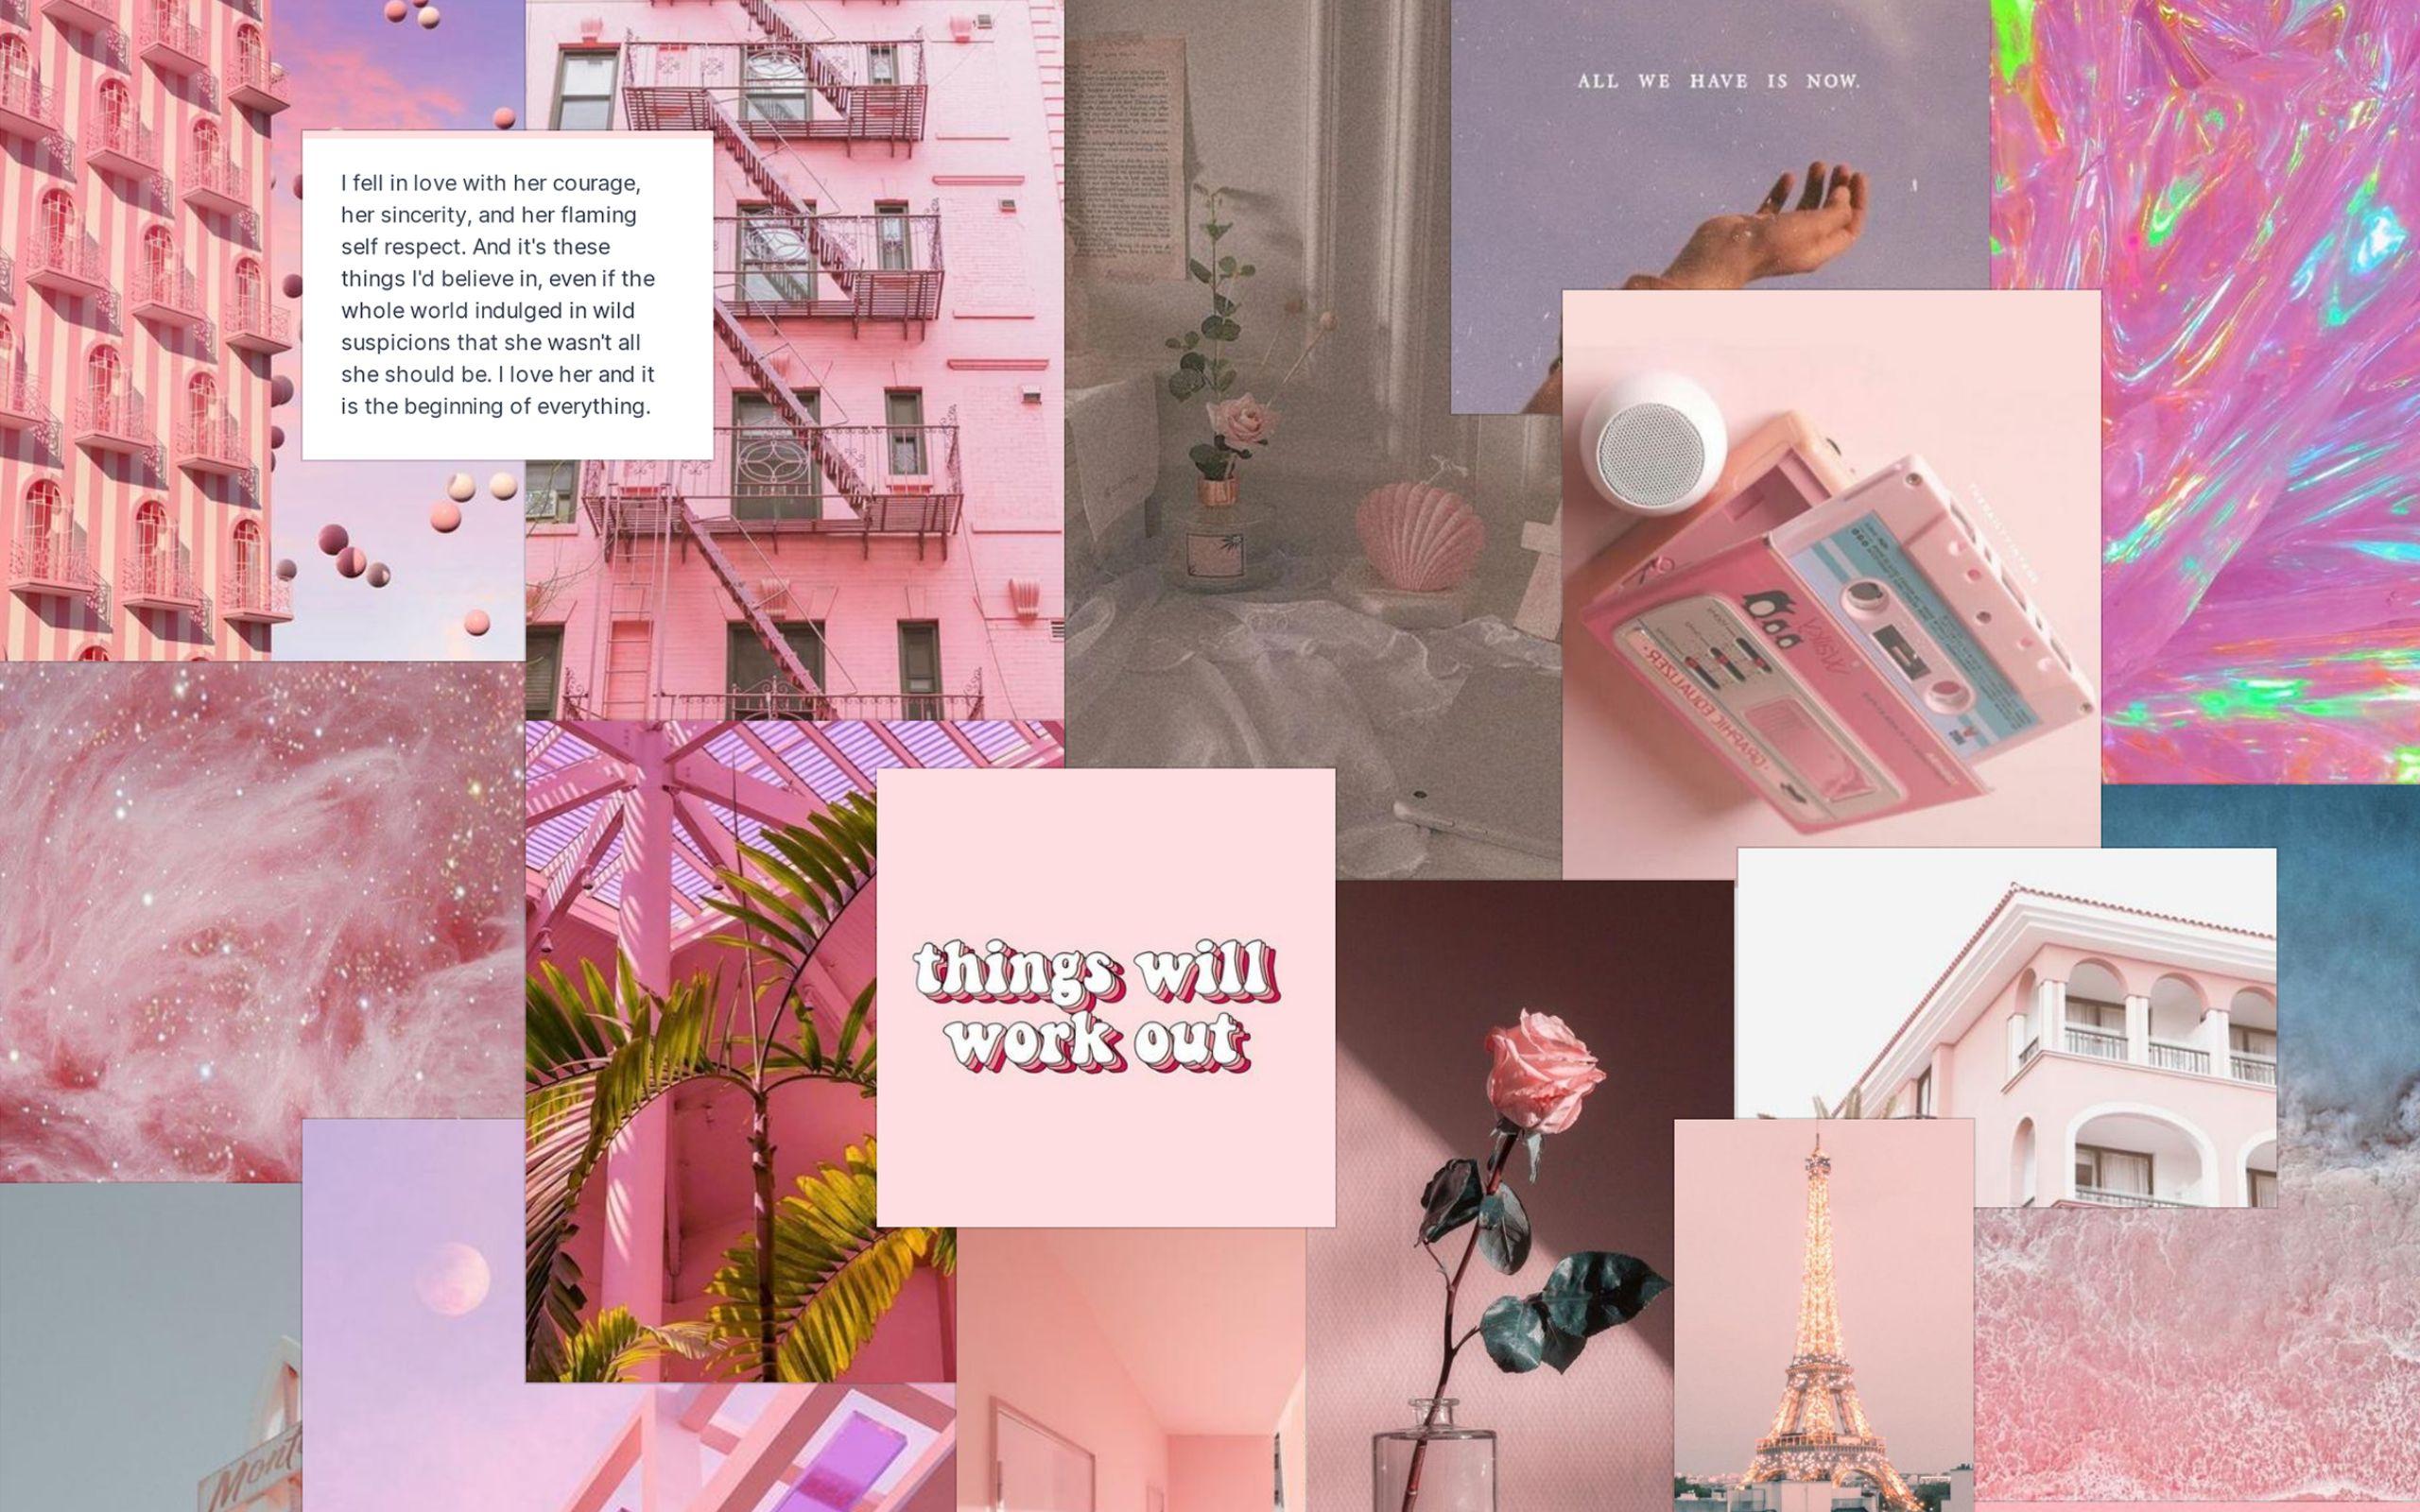 Pink Desktop Wallpaper In 2020 Pink Wallpaper Laptop Wallpaper Notebook Aesthetic Iphone Wallpaper